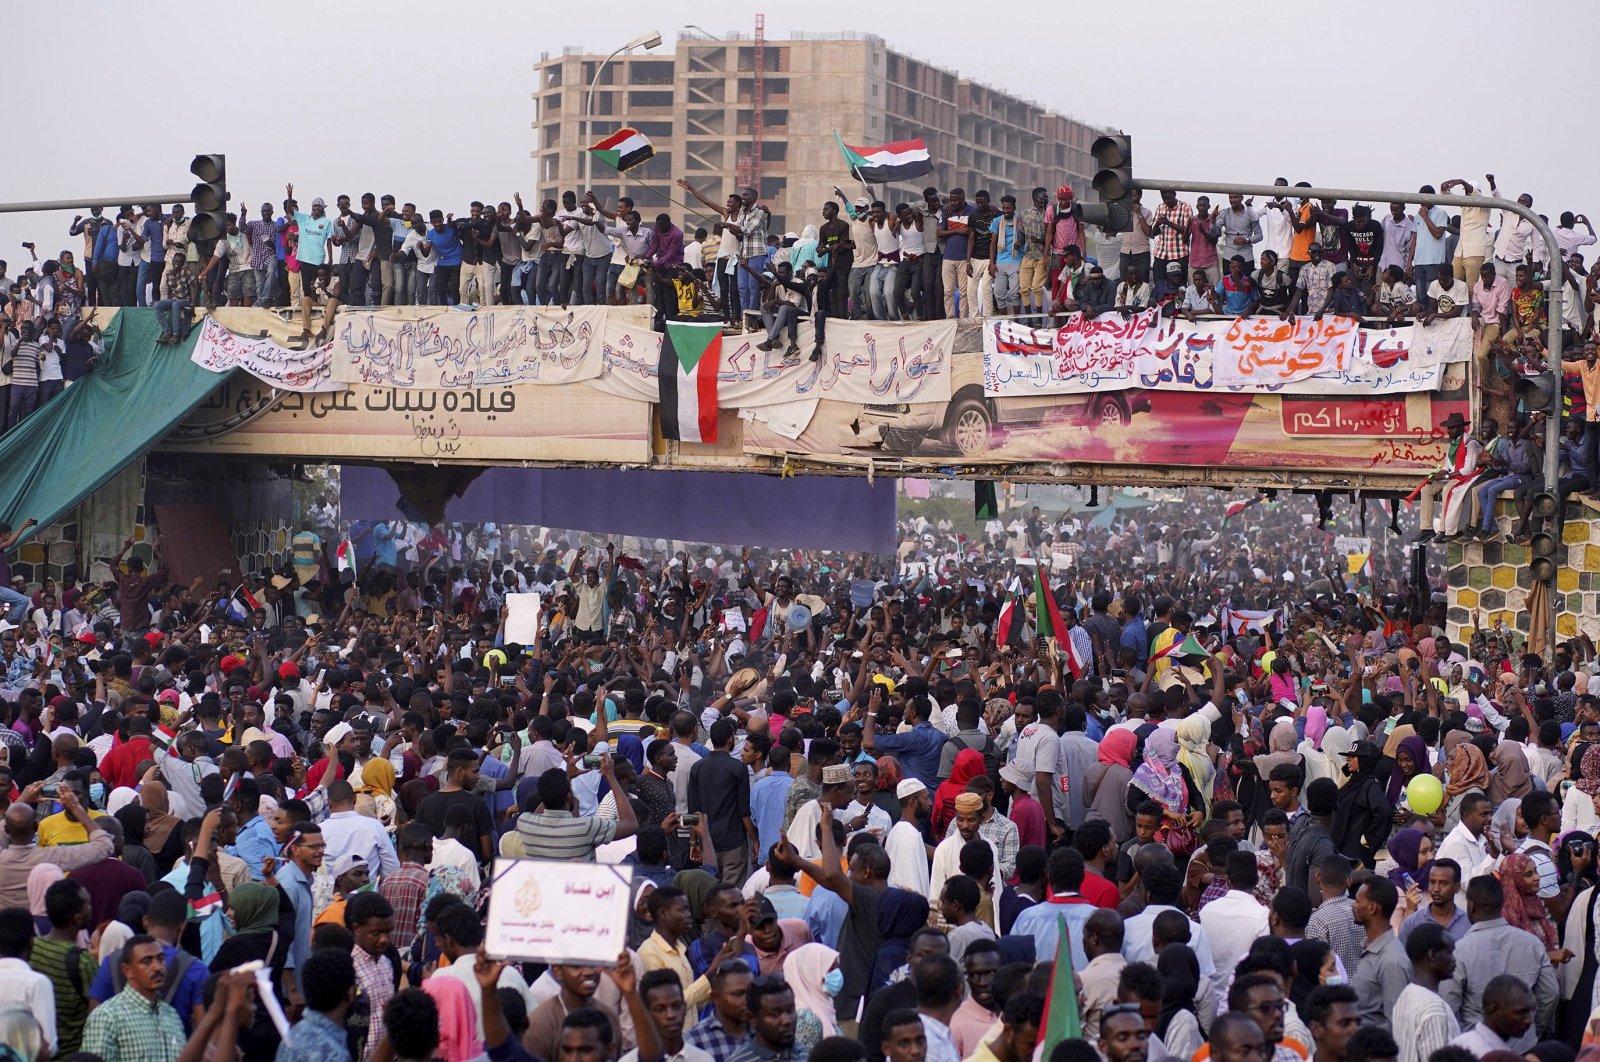 Demonstrators attend a protest rally demanding the resignation of President Omar al-Bashir, Khartoum, Sudan, April 10, 2019. (REUTERS Photo)